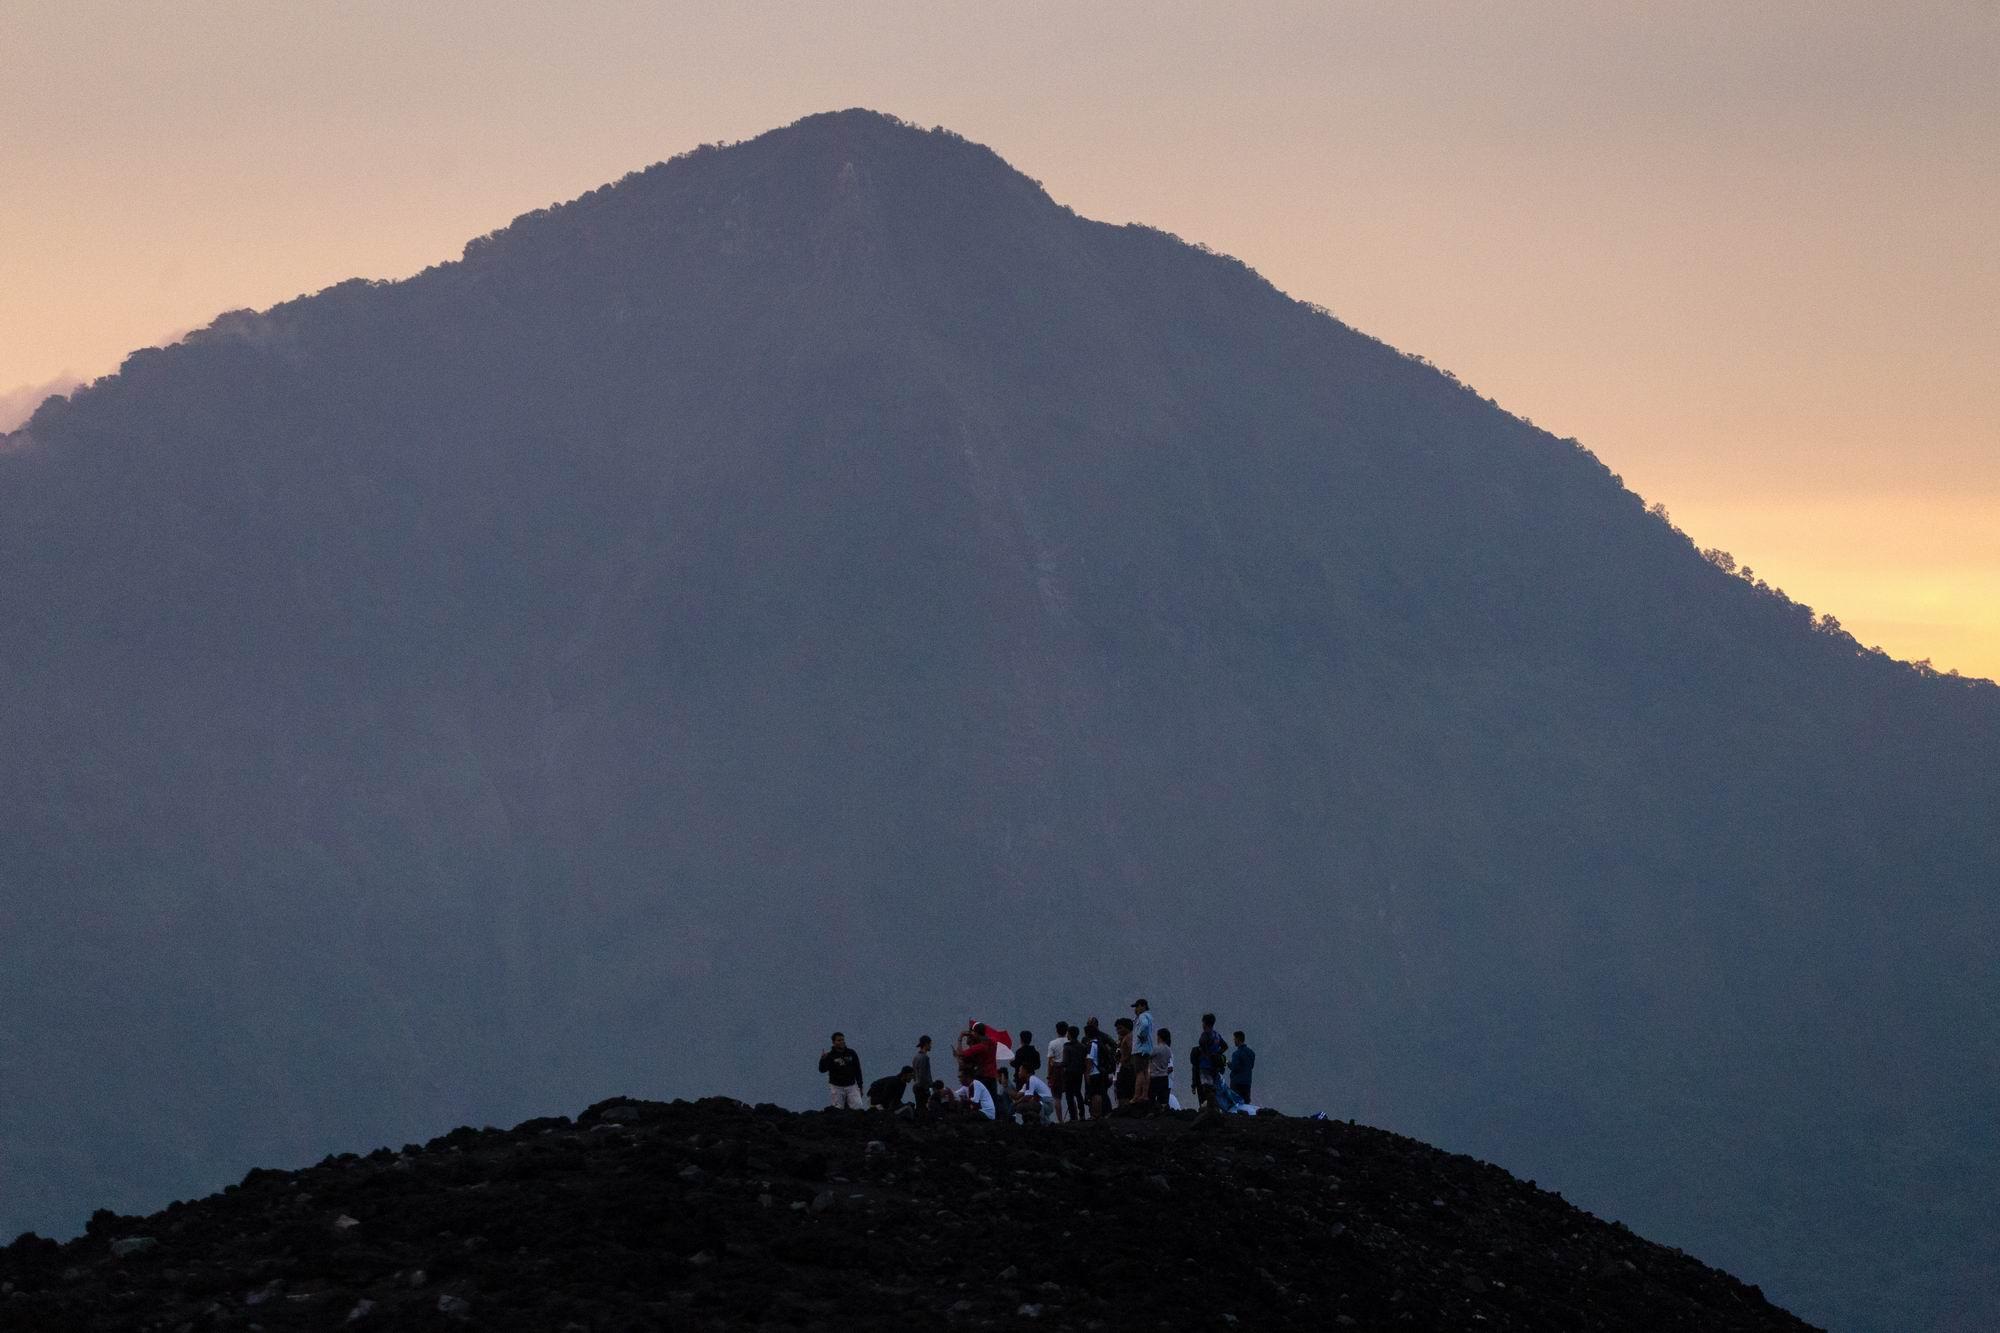 1226 Anak Krakatau ©2018 Deni Sugandi